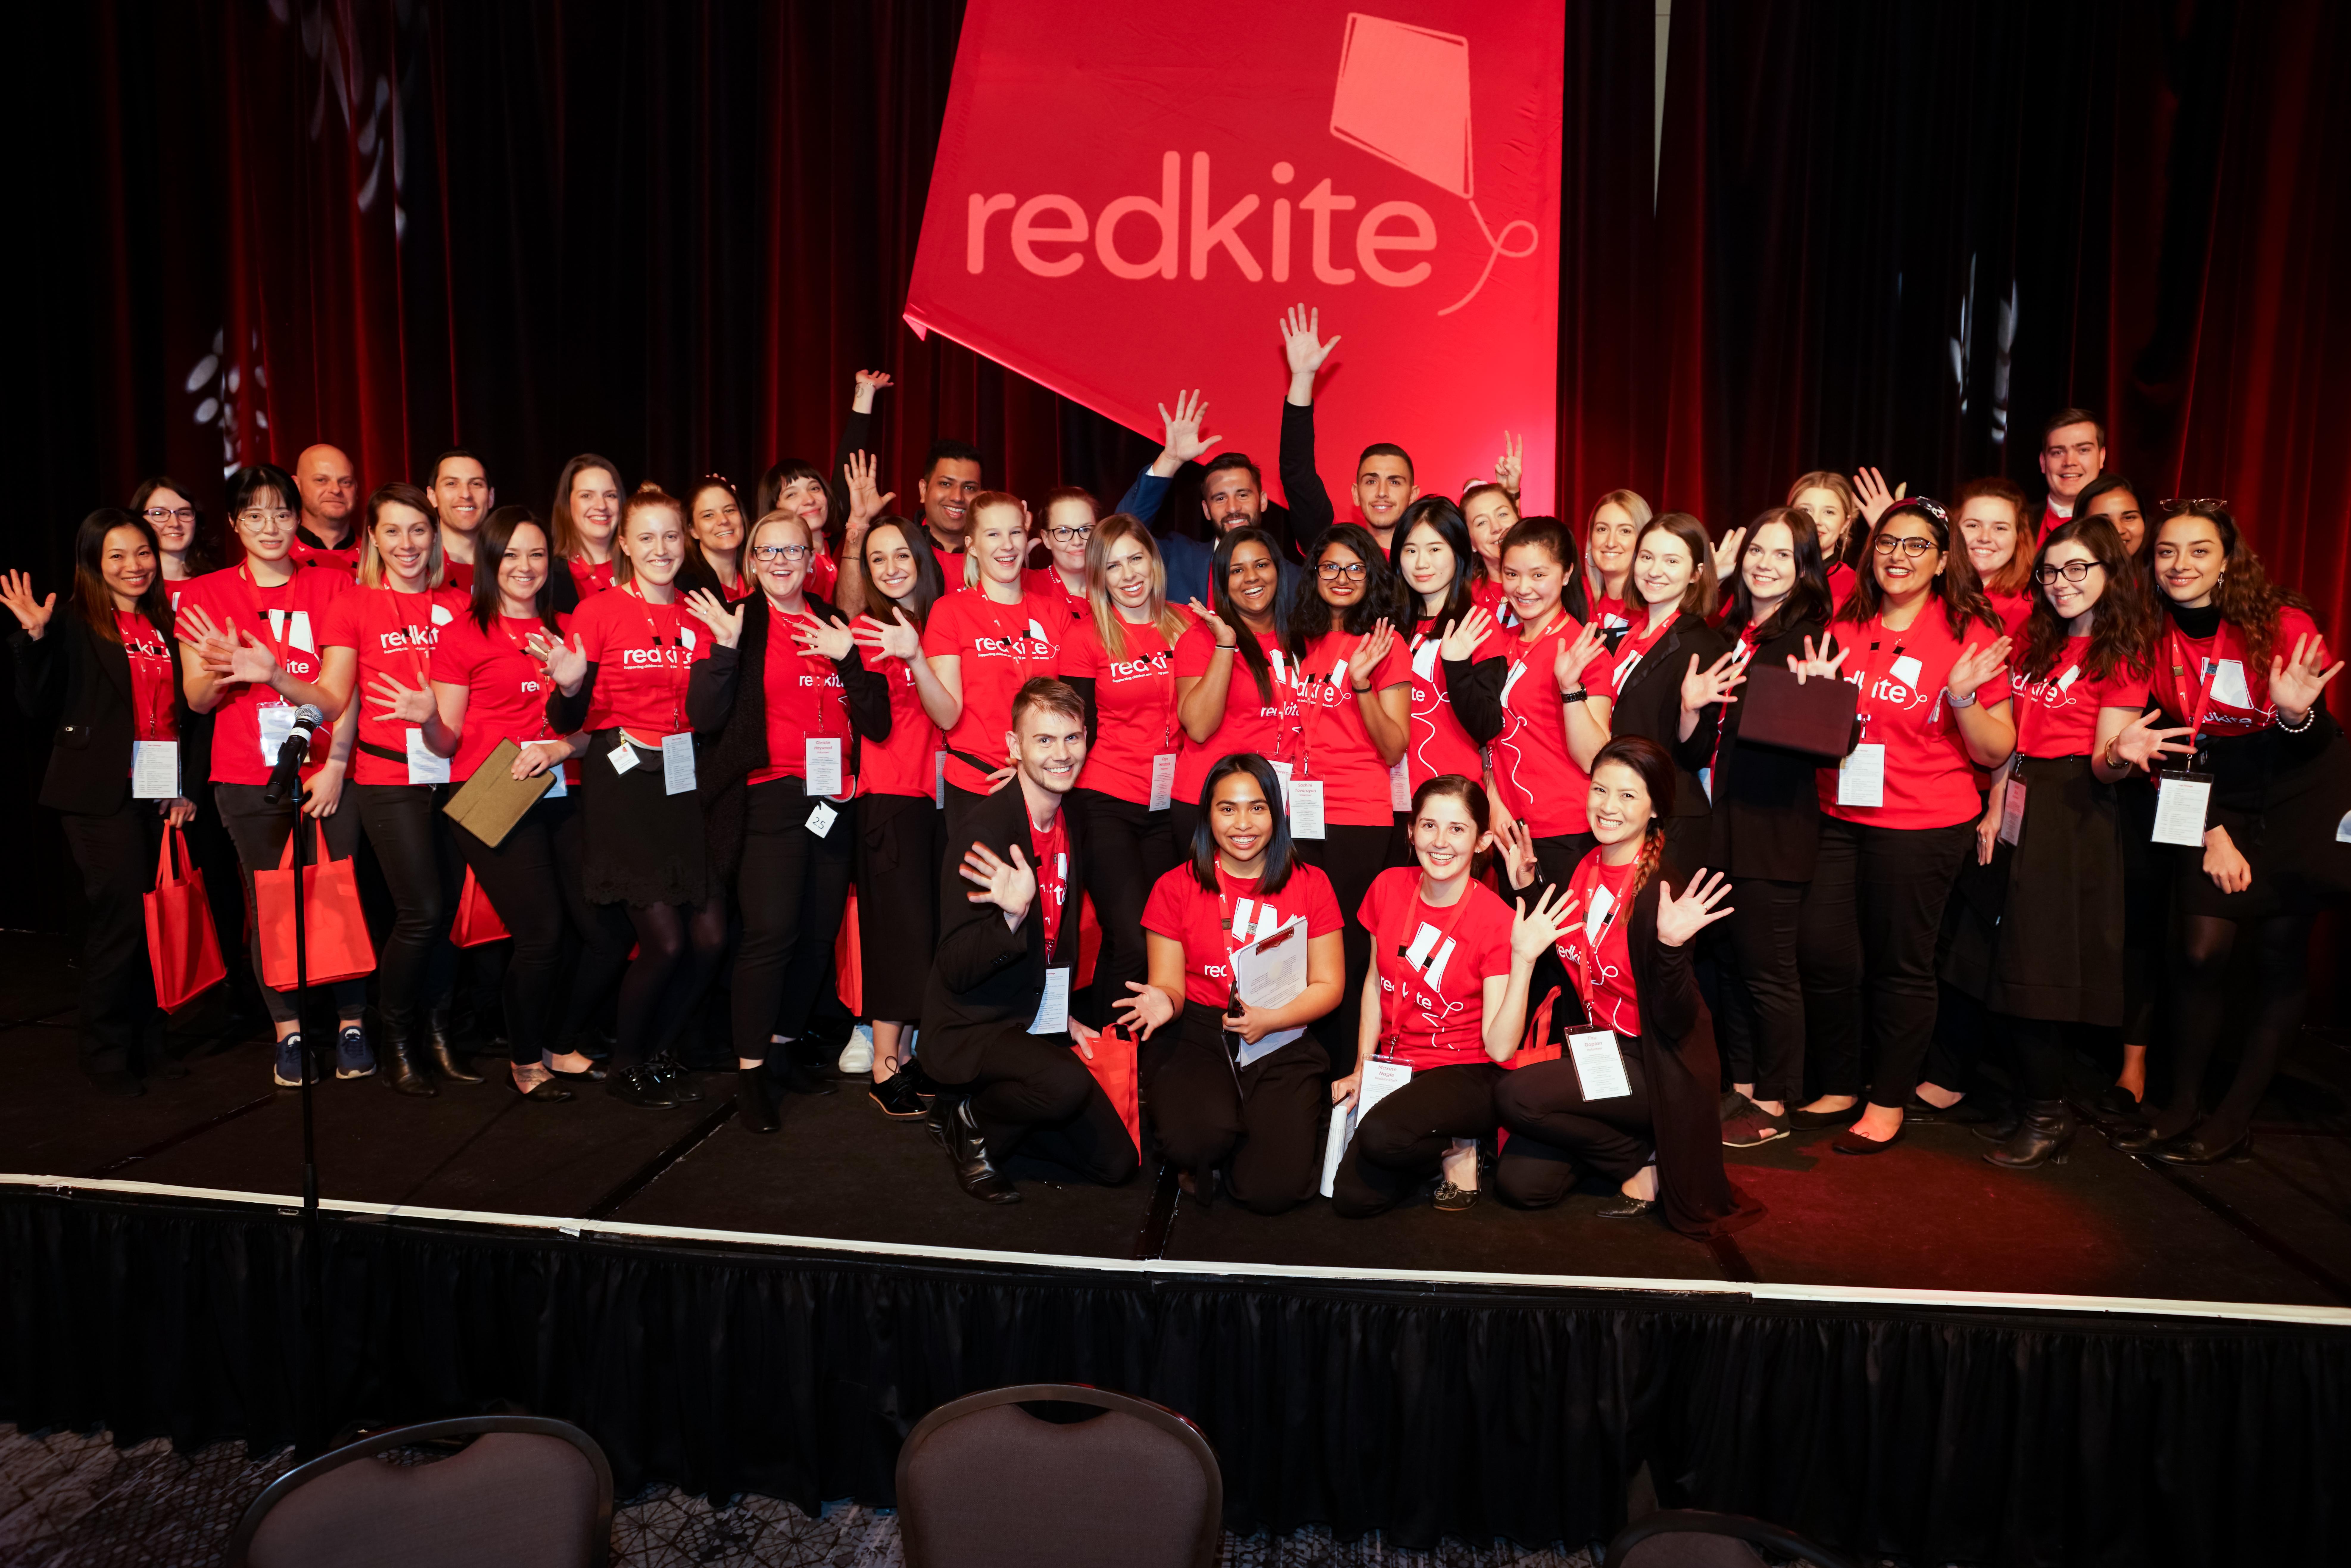 Redkite staff